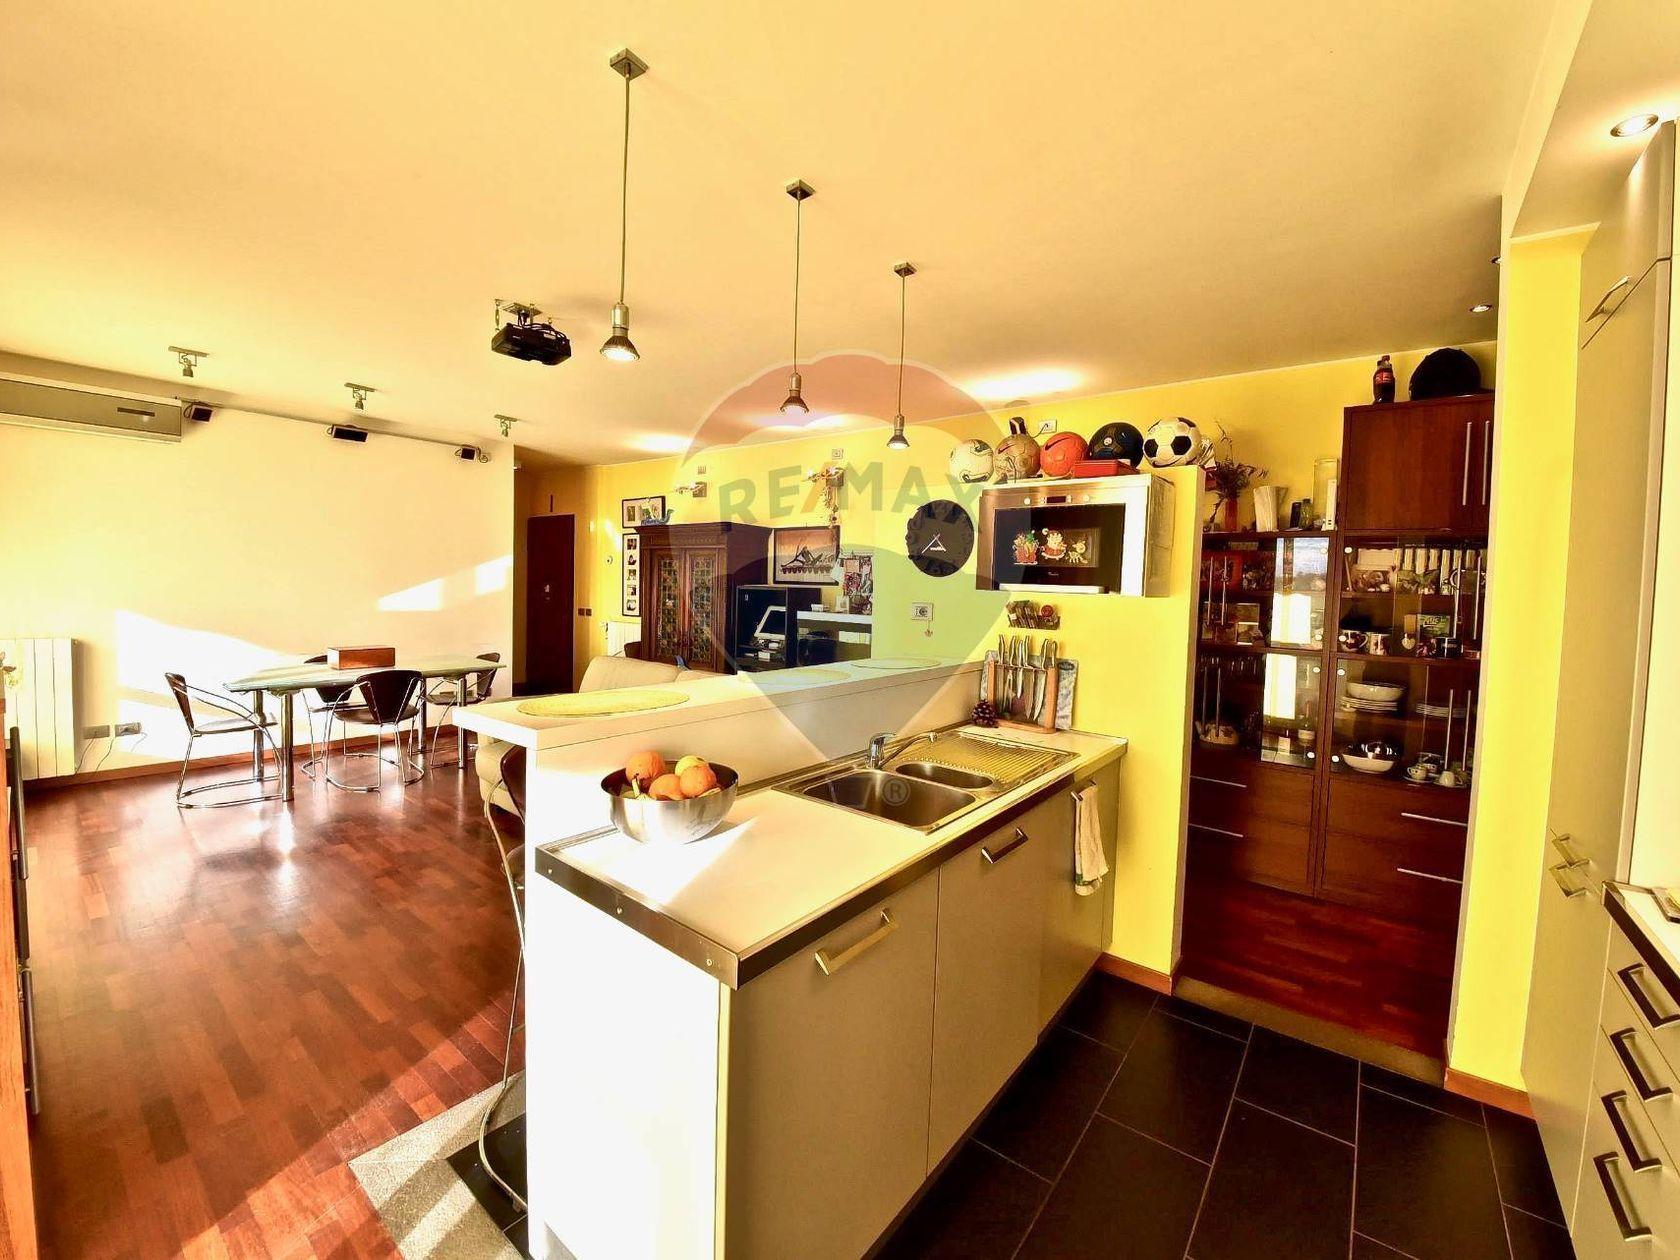 Appartamento Cascina ferrara, Saronno, VA Vendita - Foto 2